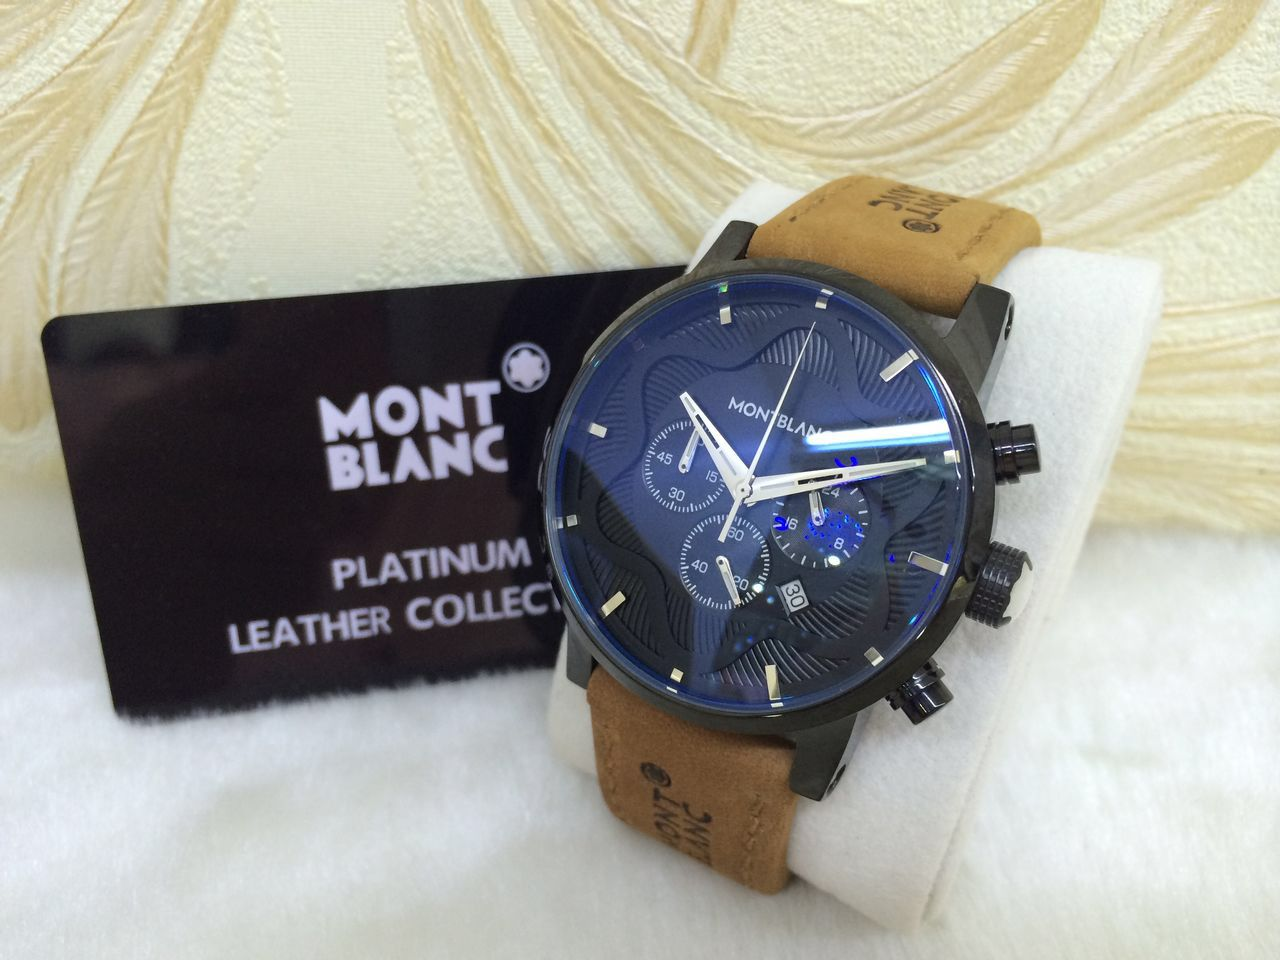 1d554e274 ساعات Mont Blanc ... hublot كوبي وان طبق الأصل - منتديات عبير